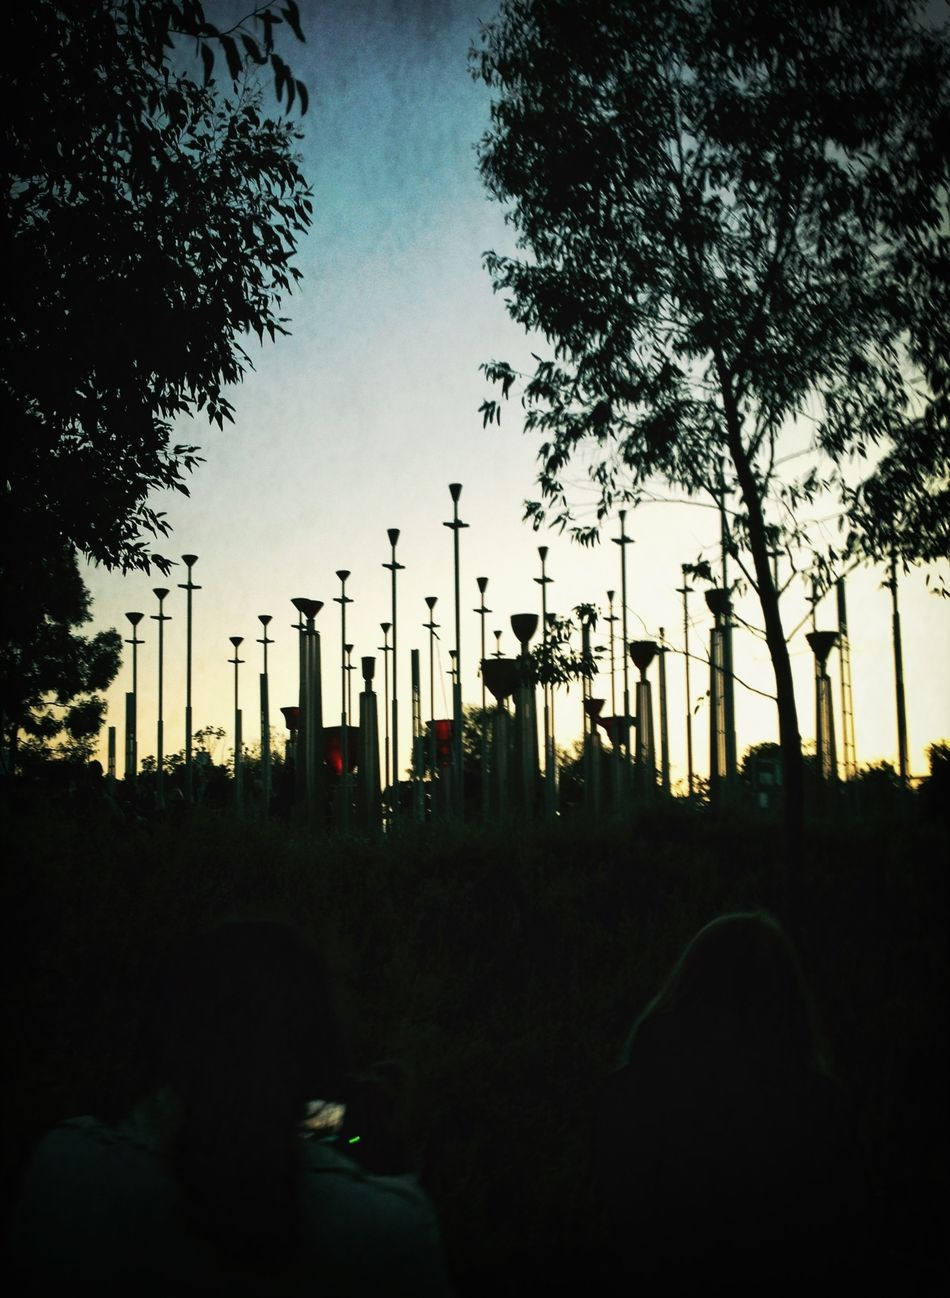 Federation Bells NEM Landscapes Mob Fiction EyeEm Melbourne Music